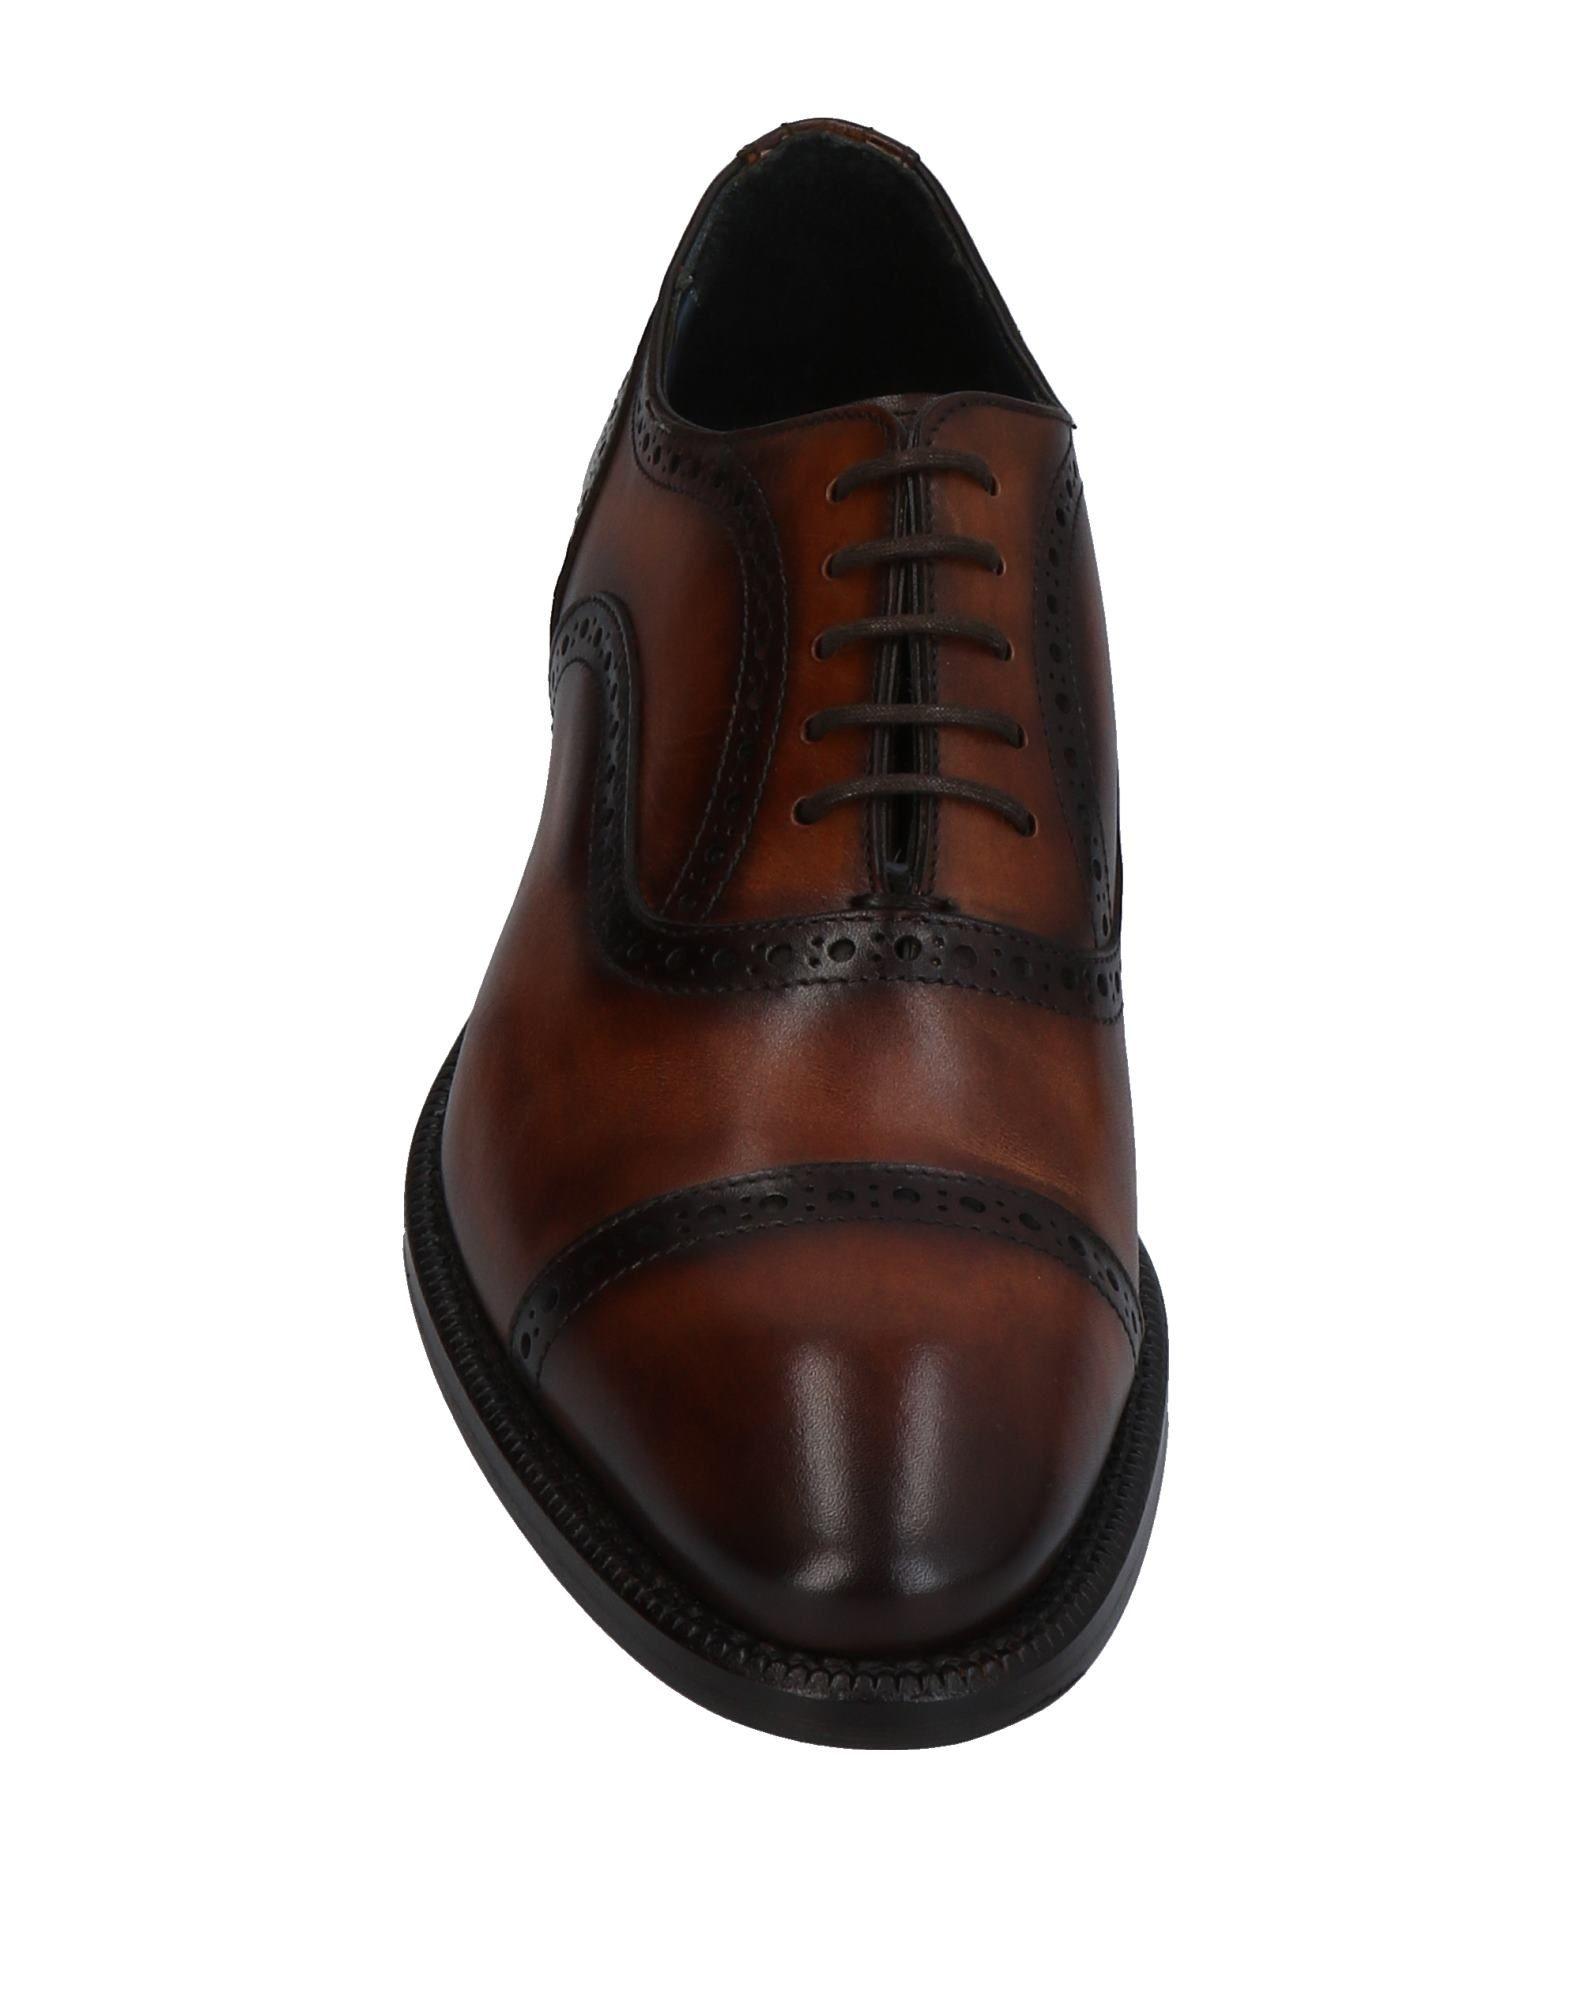 Rabatt echte Schnürschuhe Schuhe Zampiere Schnürschuhe echte Herren  11457063QM 1faf81